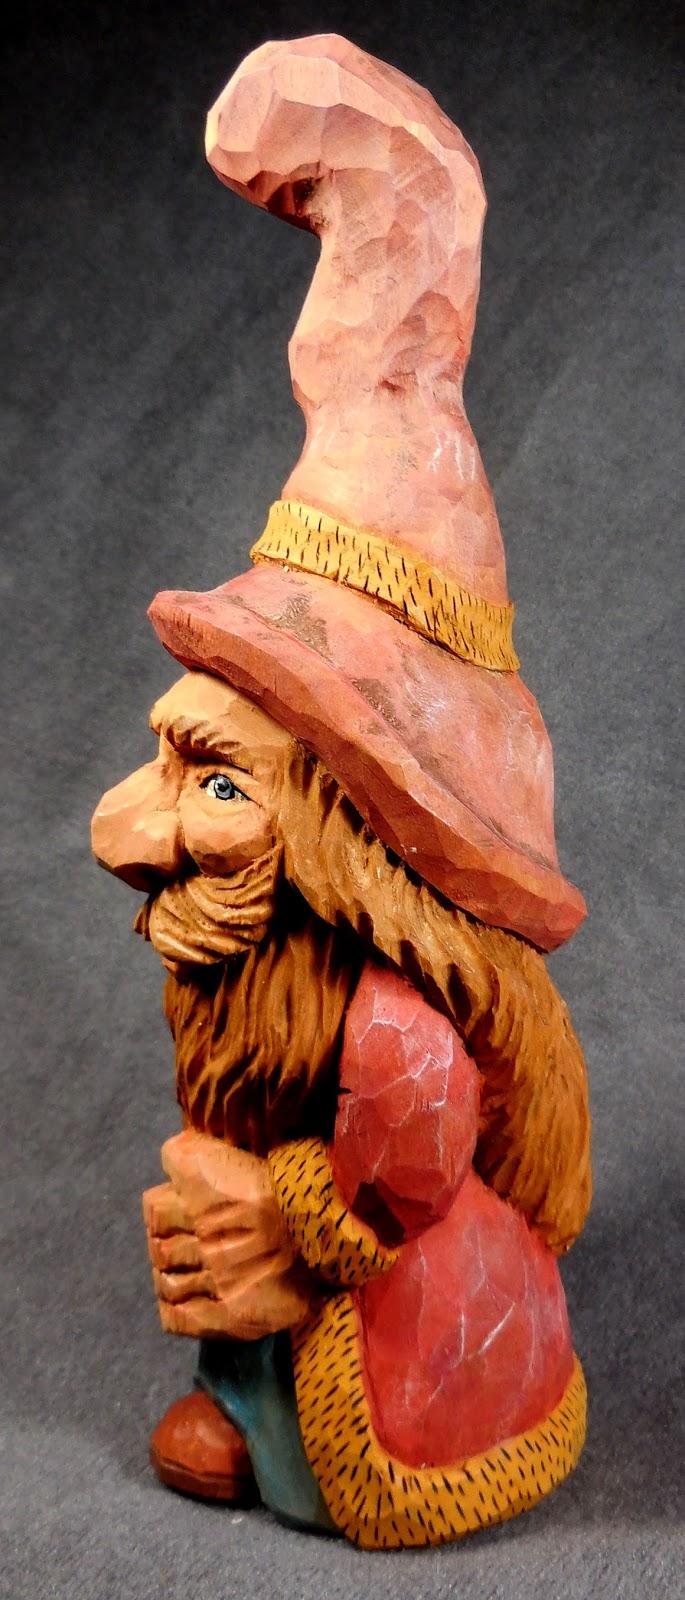 North idaho carver: woodsman